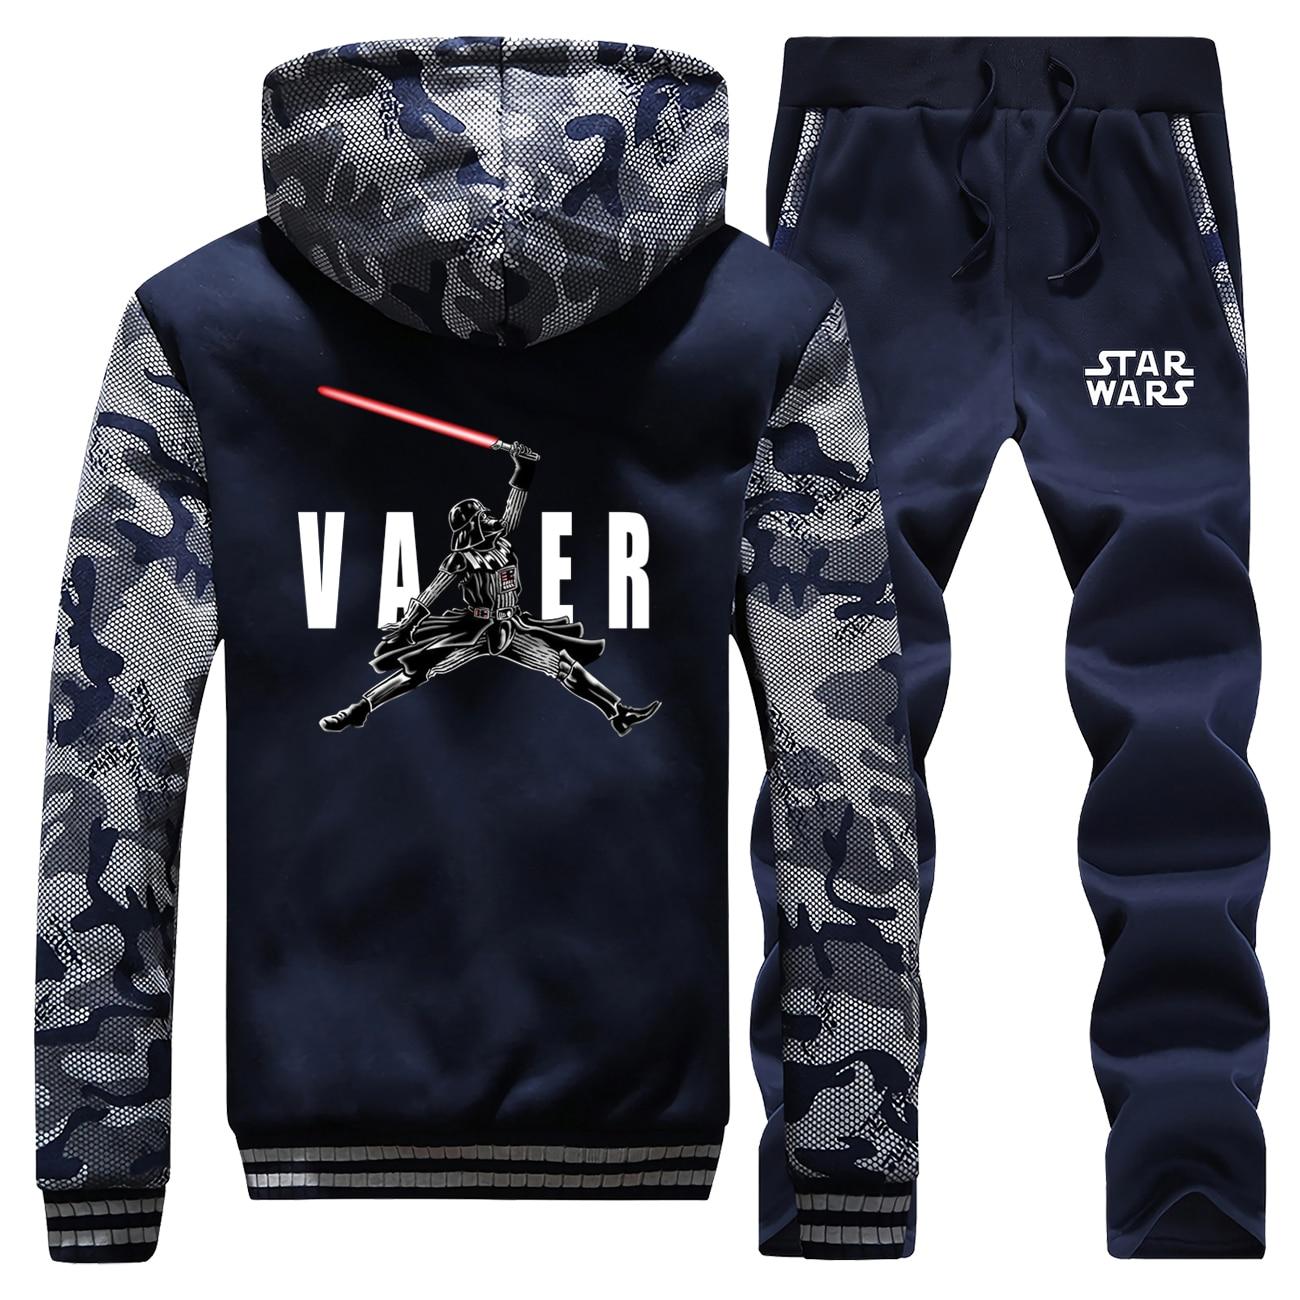 2019 Winter Men Coat Thick Hoody Darth Vader Star Wars Cartoon Hoodies Suit Sportswear Camouflage Warm Jacket+2 Piece Set Pants